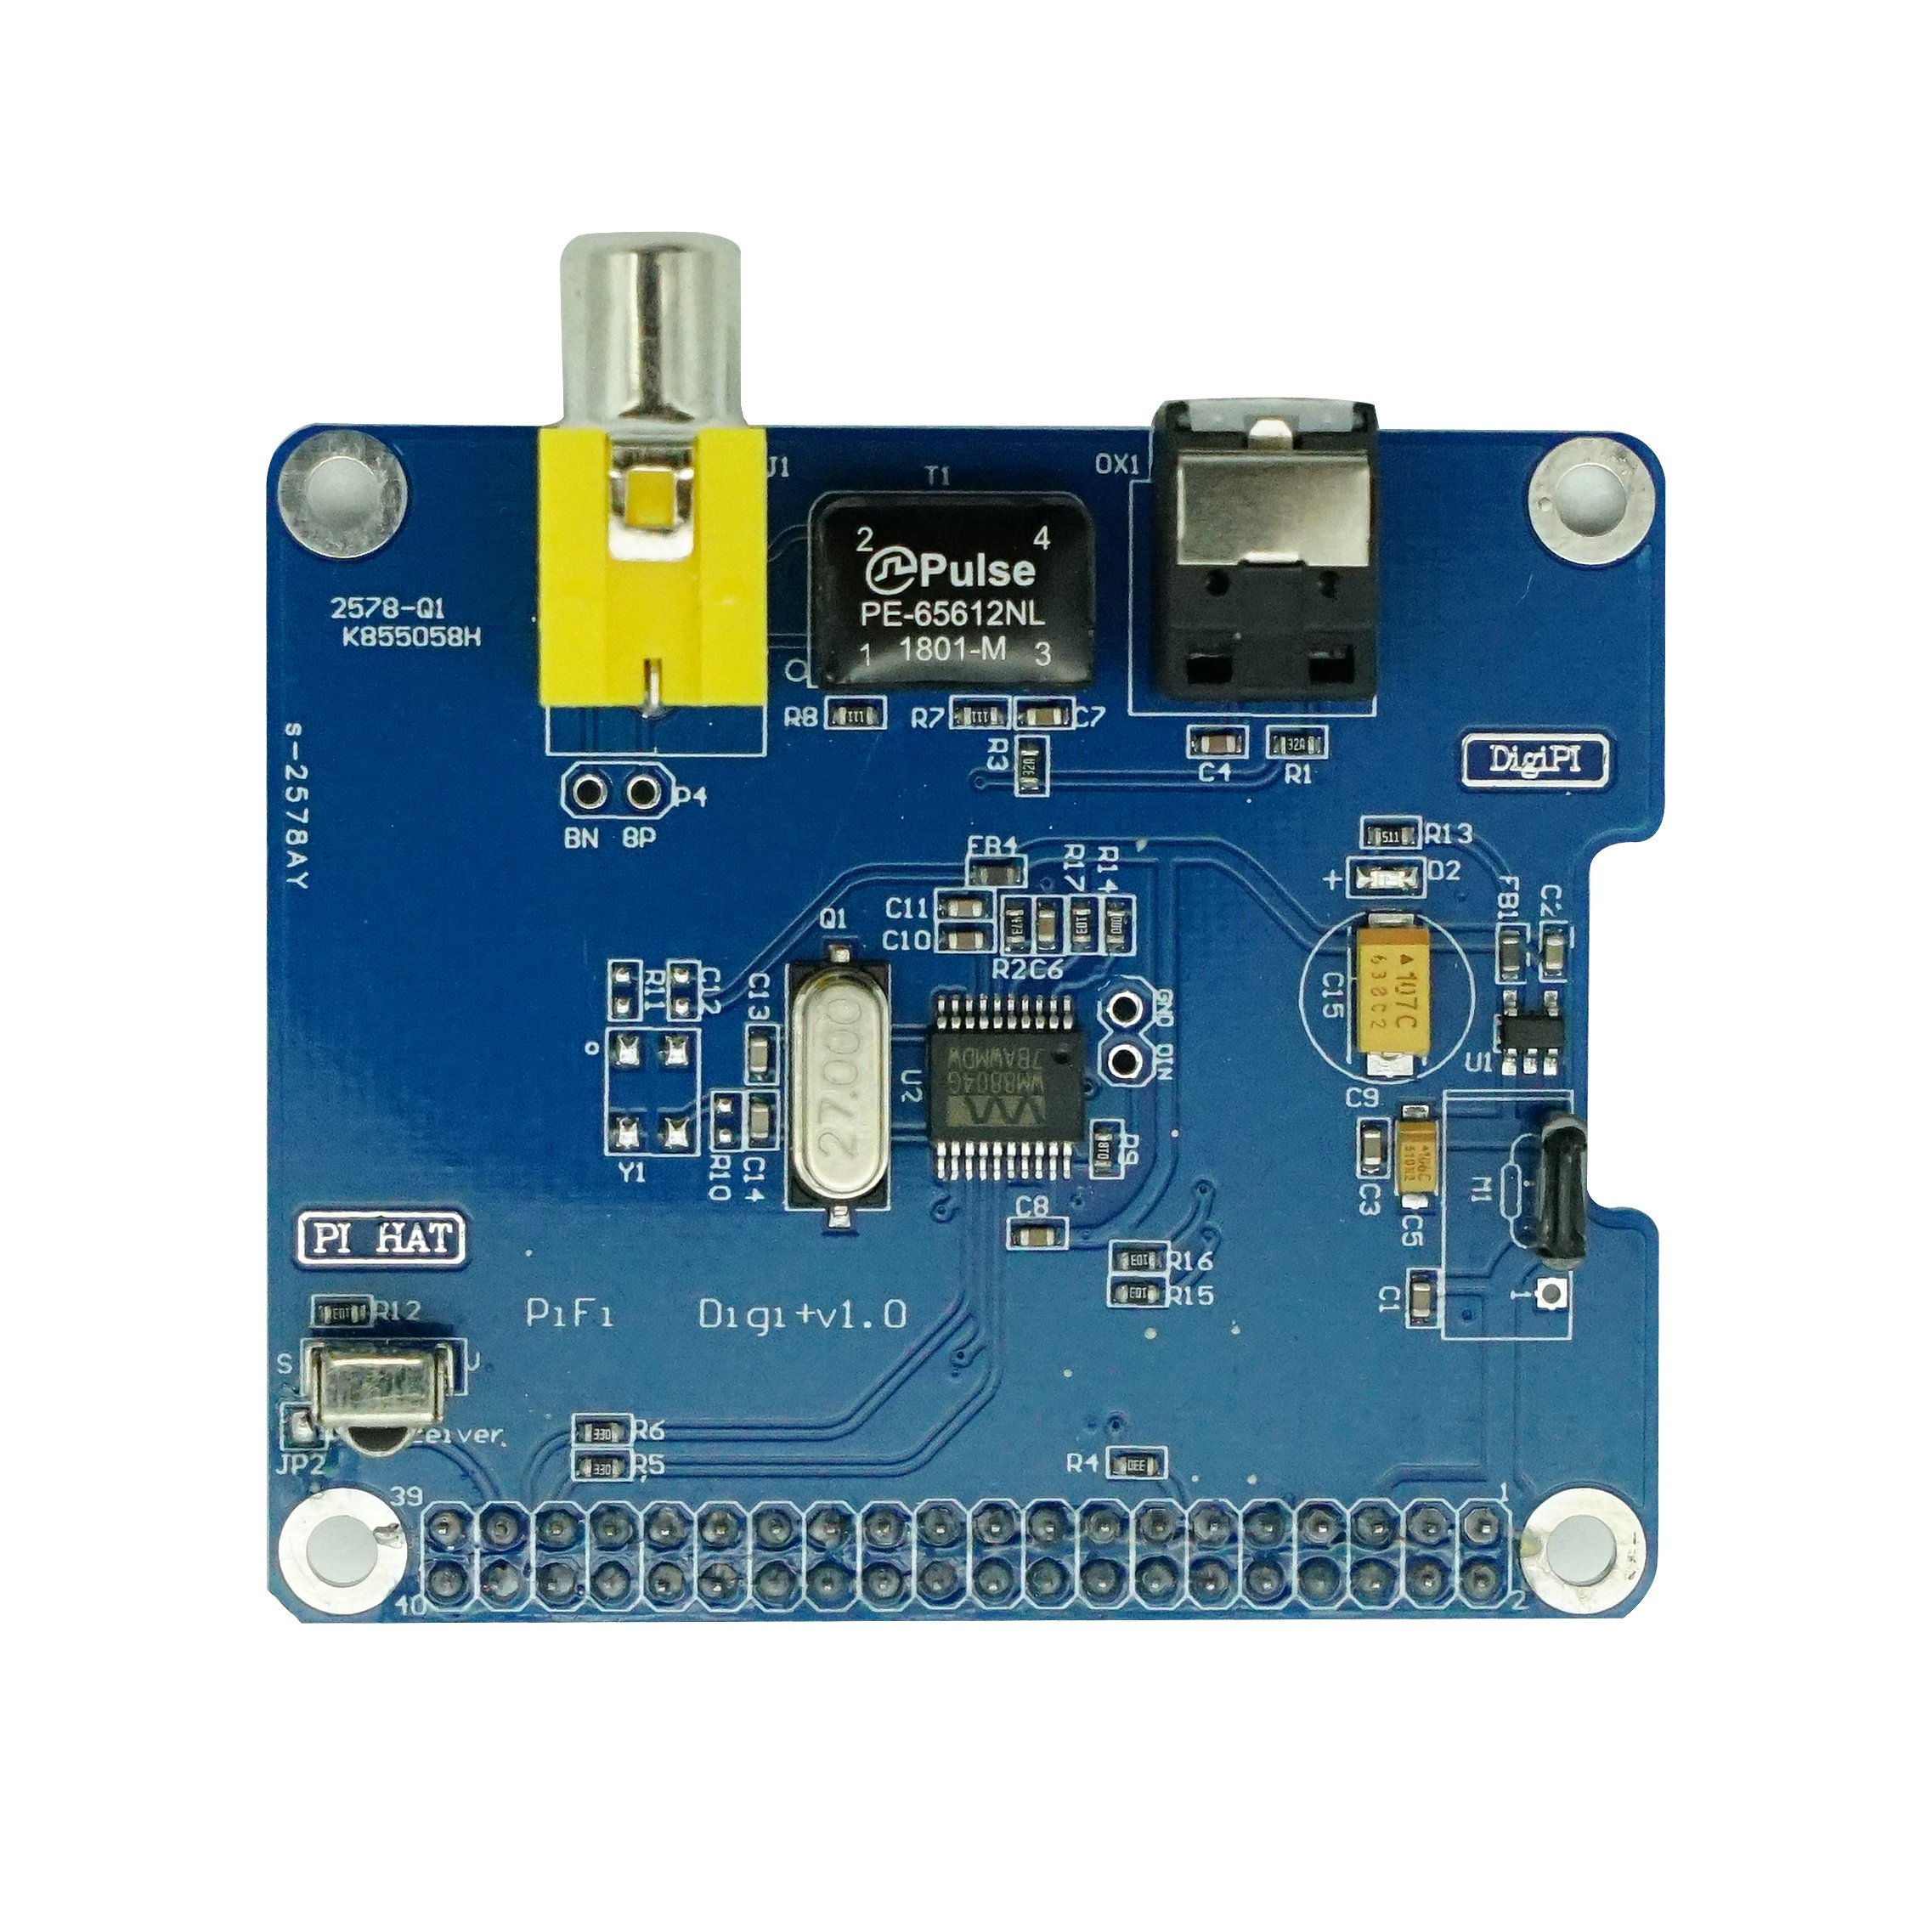 Geekteches HiFi DiGi+ Digital Sound Card Module I2S SPDIF Interface, Optical Fiber for Raspberry Pi 3 Model B+/3B/2B/B+